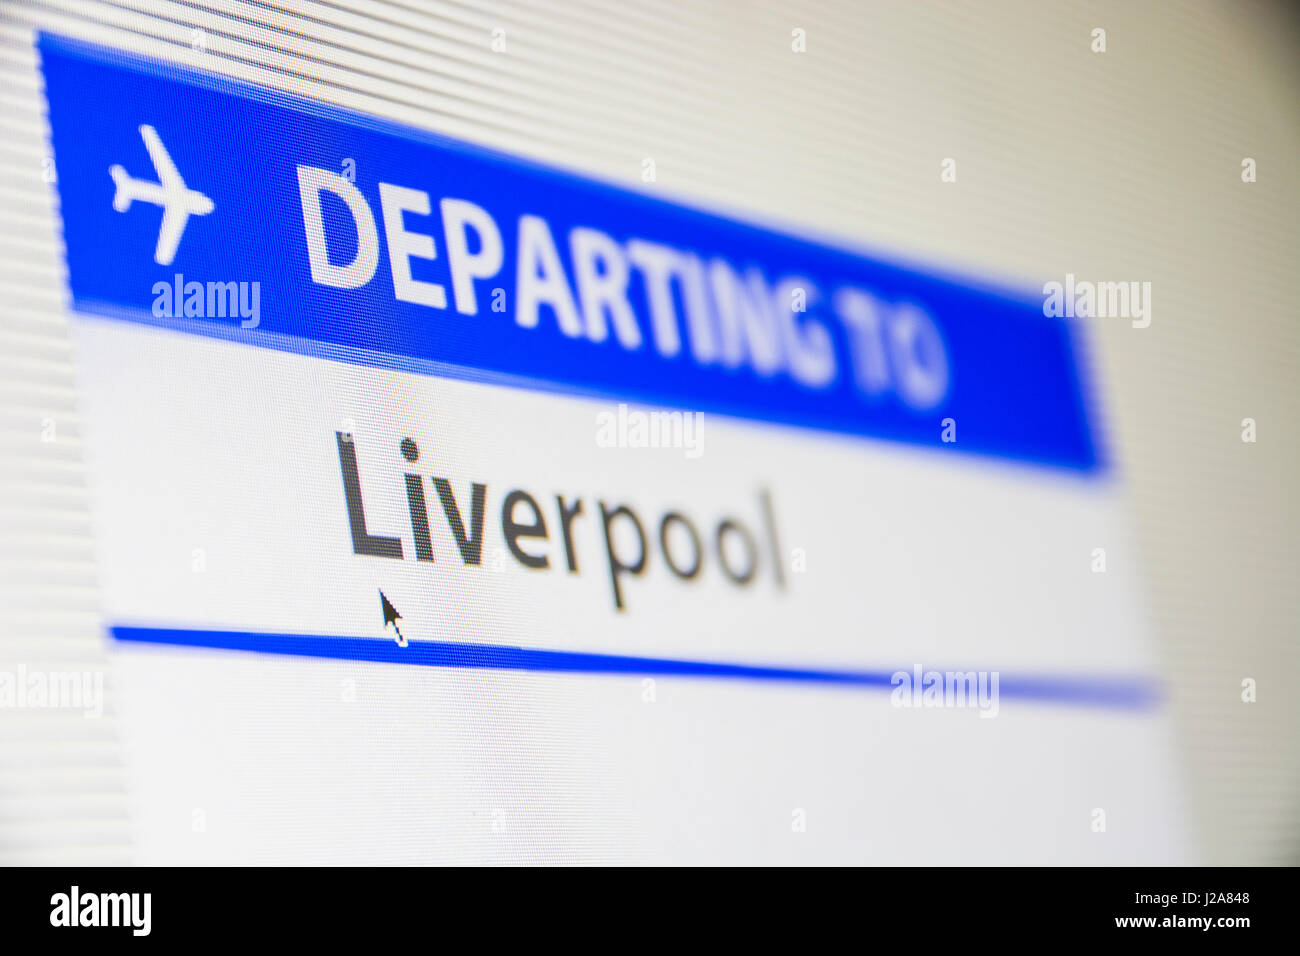 Computer screen close-up of status of flight departing to Liverpool, England, UK - Stock Image